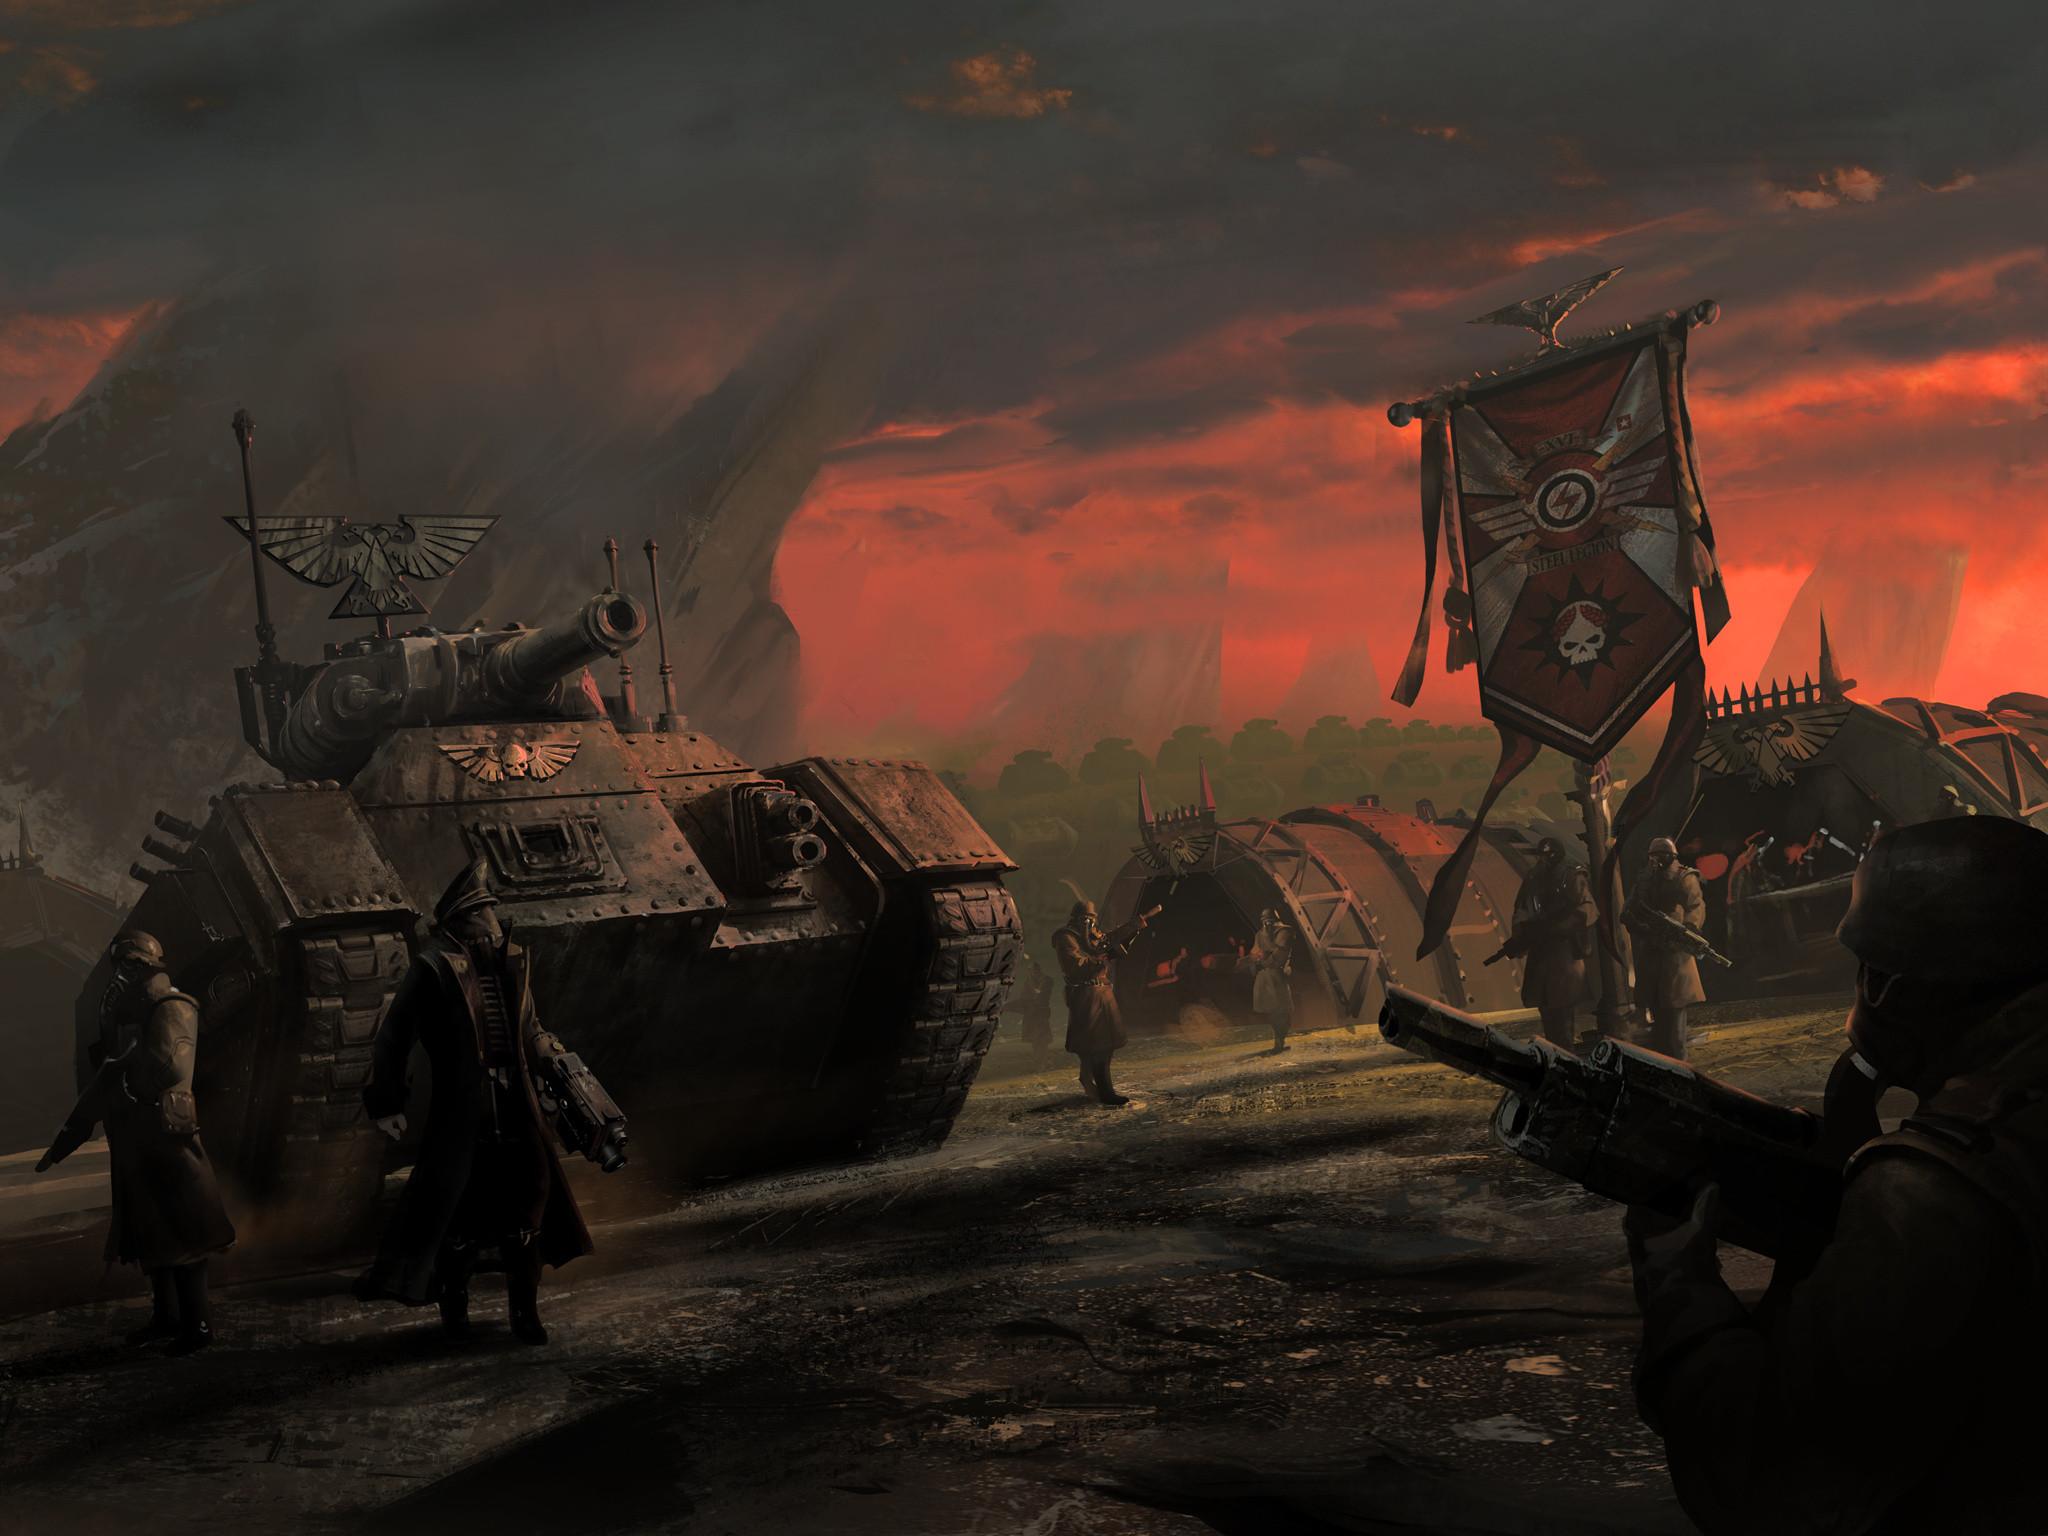 Imperial Guard Warhammer 40k Astra Militarum Armageddon